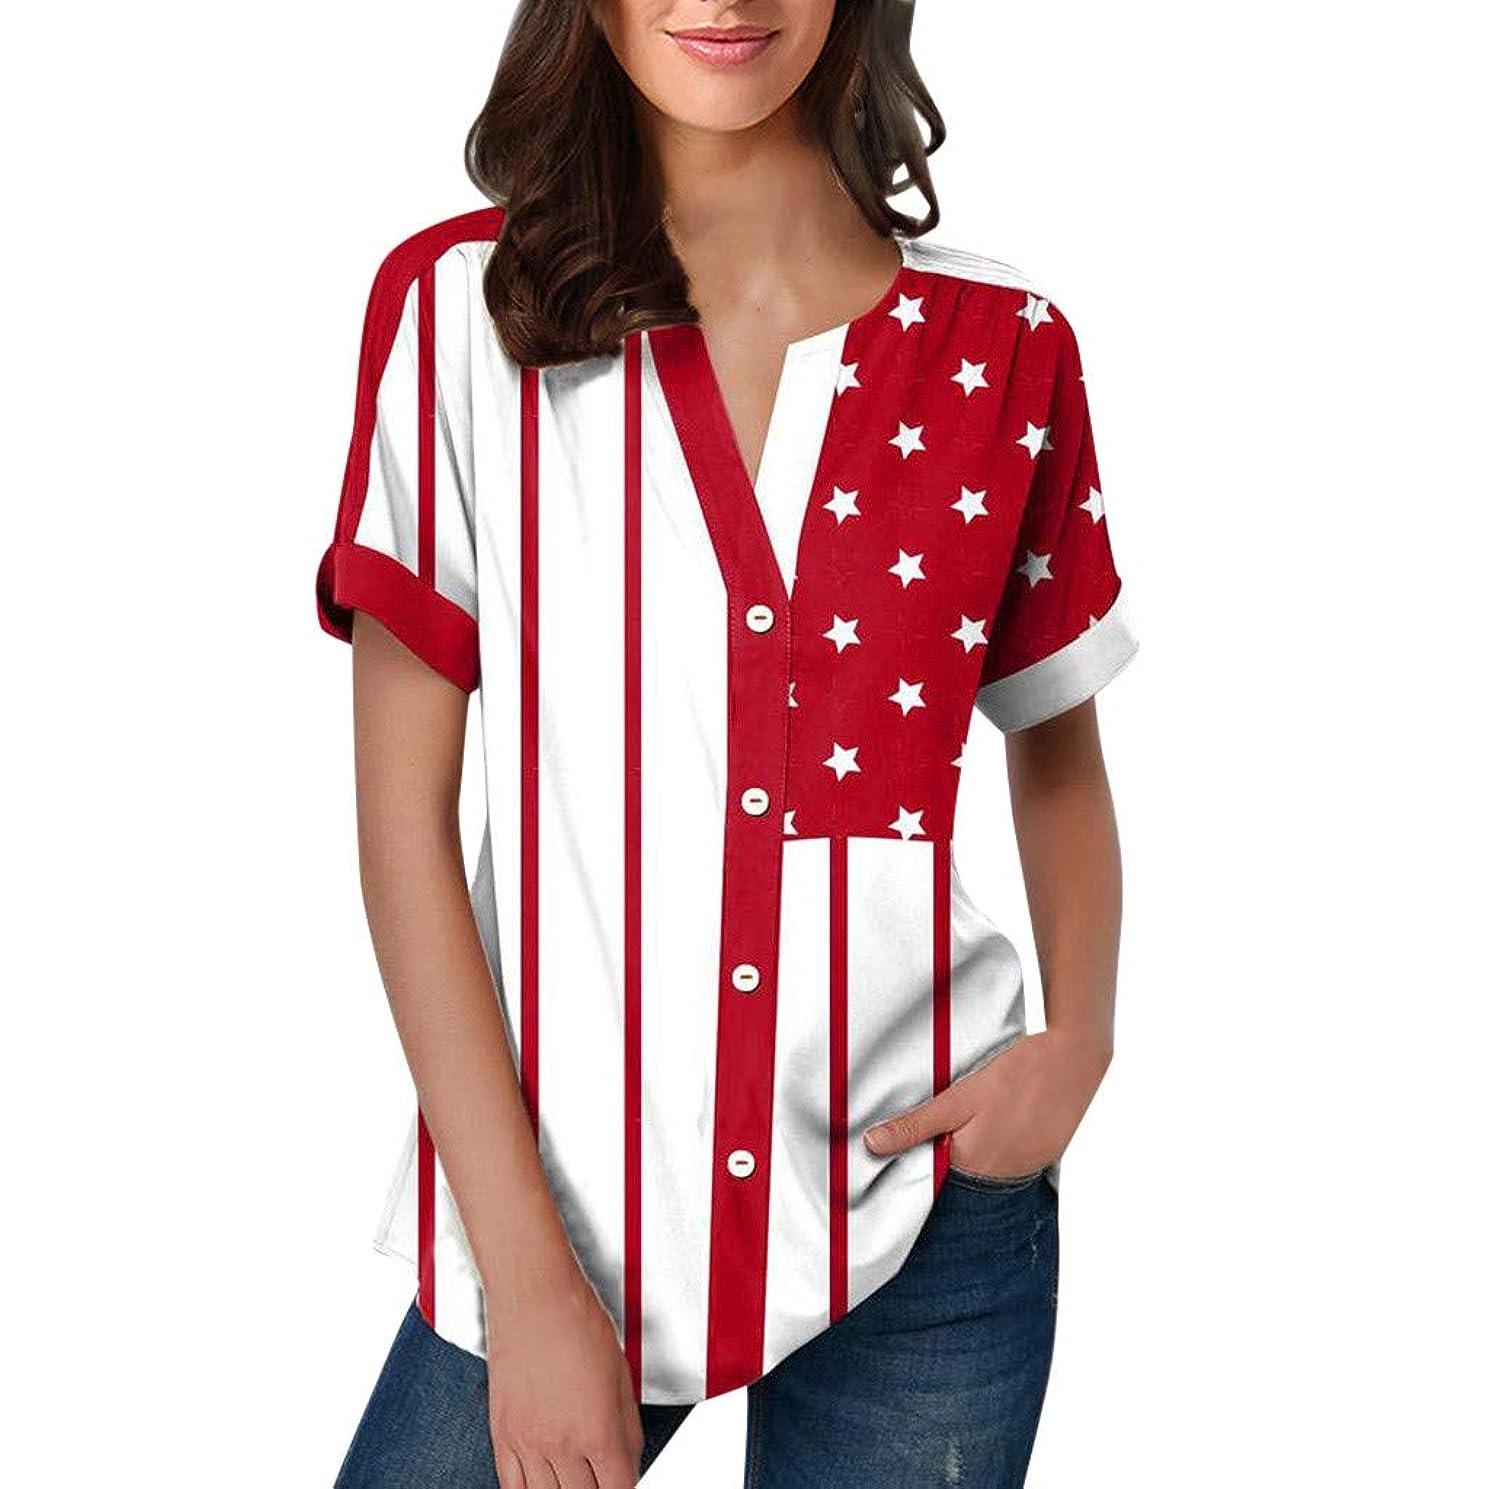 Summer Tops for Women 2019 Tronet Women's Summer American Flag Independence Day Short Sleeve Hem Split Shirt